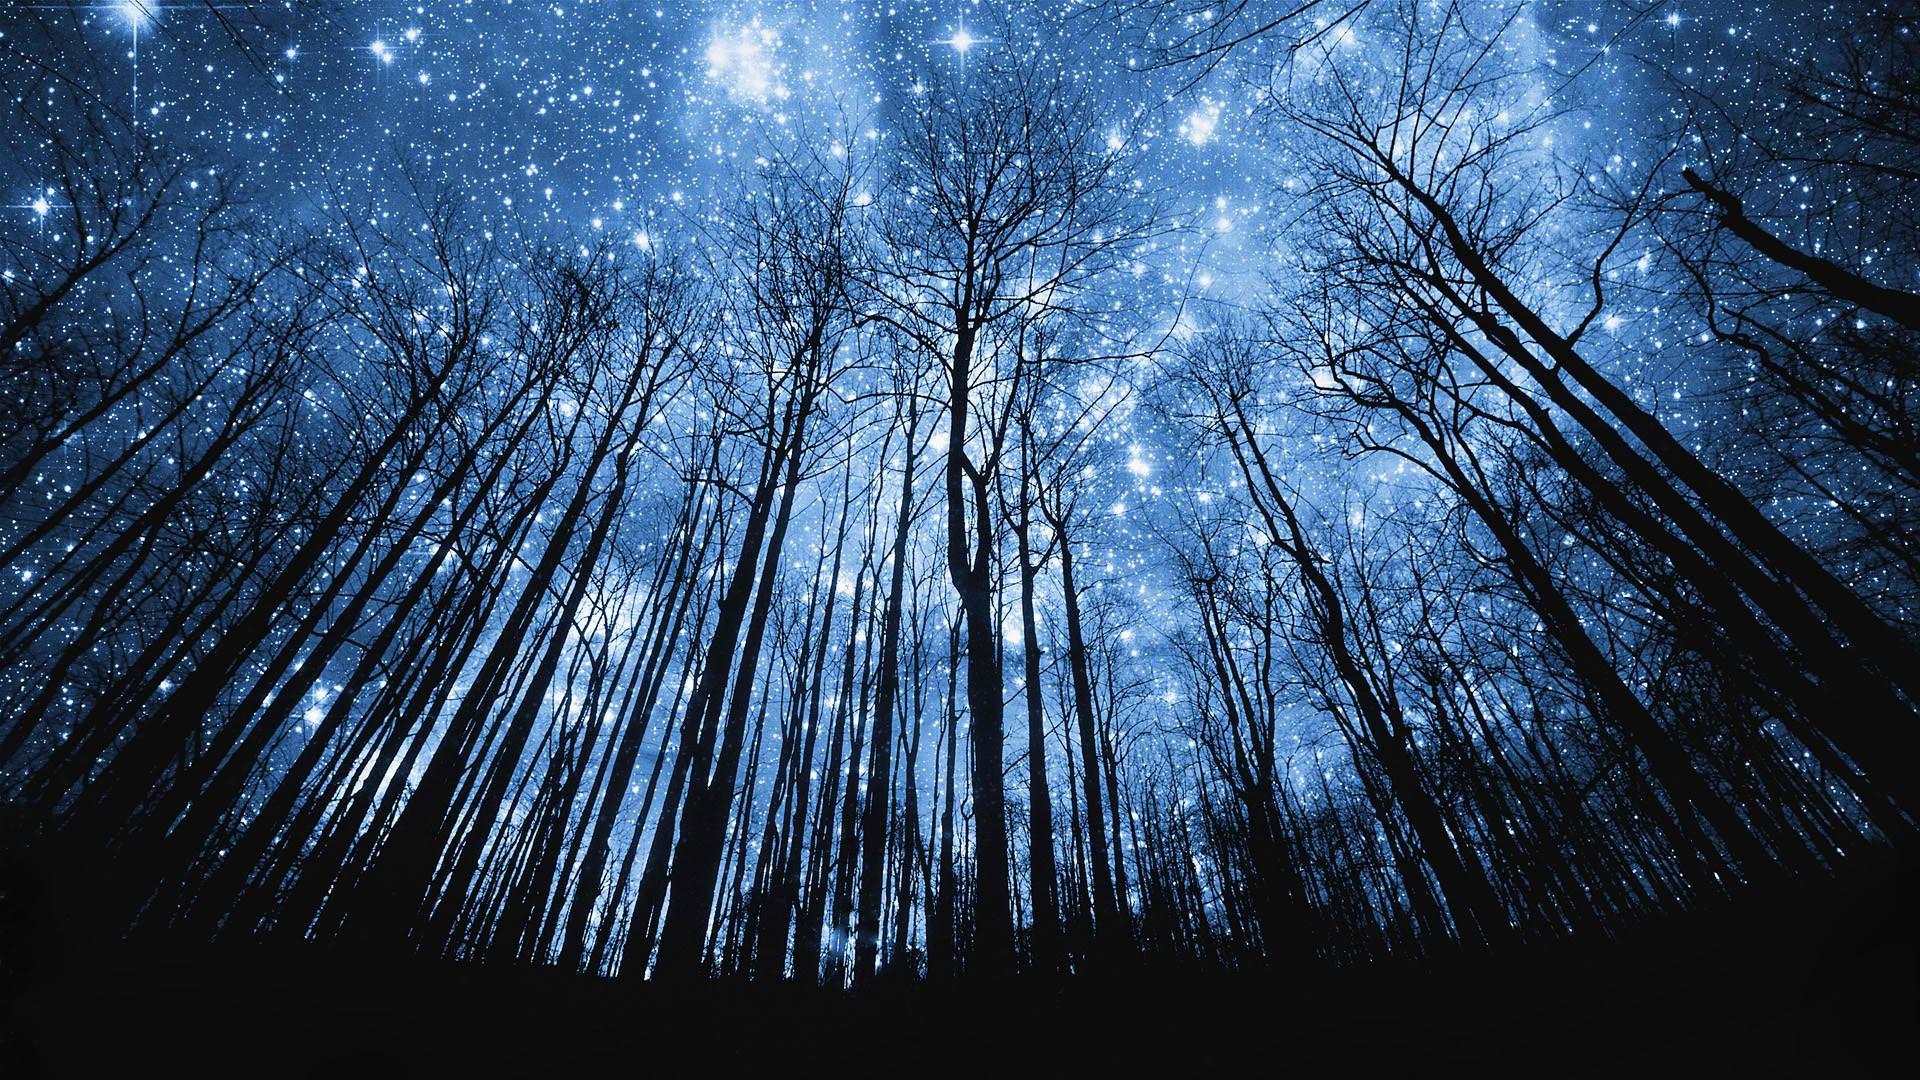 Hd Space Wallpaper Stars Astro Desktop Images High Stars Wallpaper Hd 1080p 34401 Hd Wallpaper Backgrounds Download